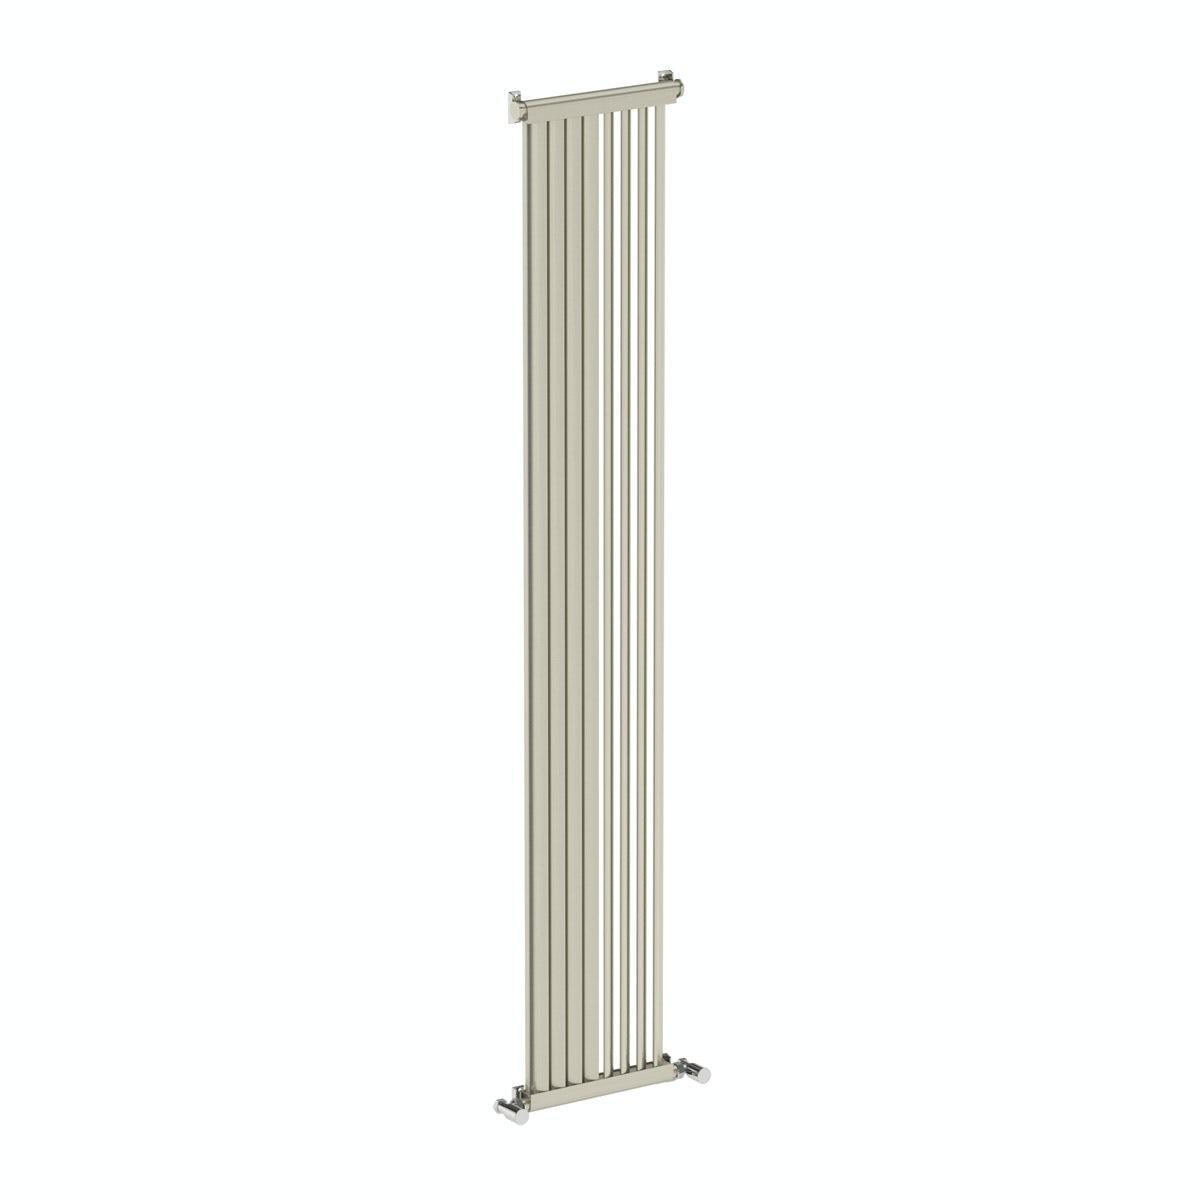 Mode Zephyra vertical radiator 1800 x 328